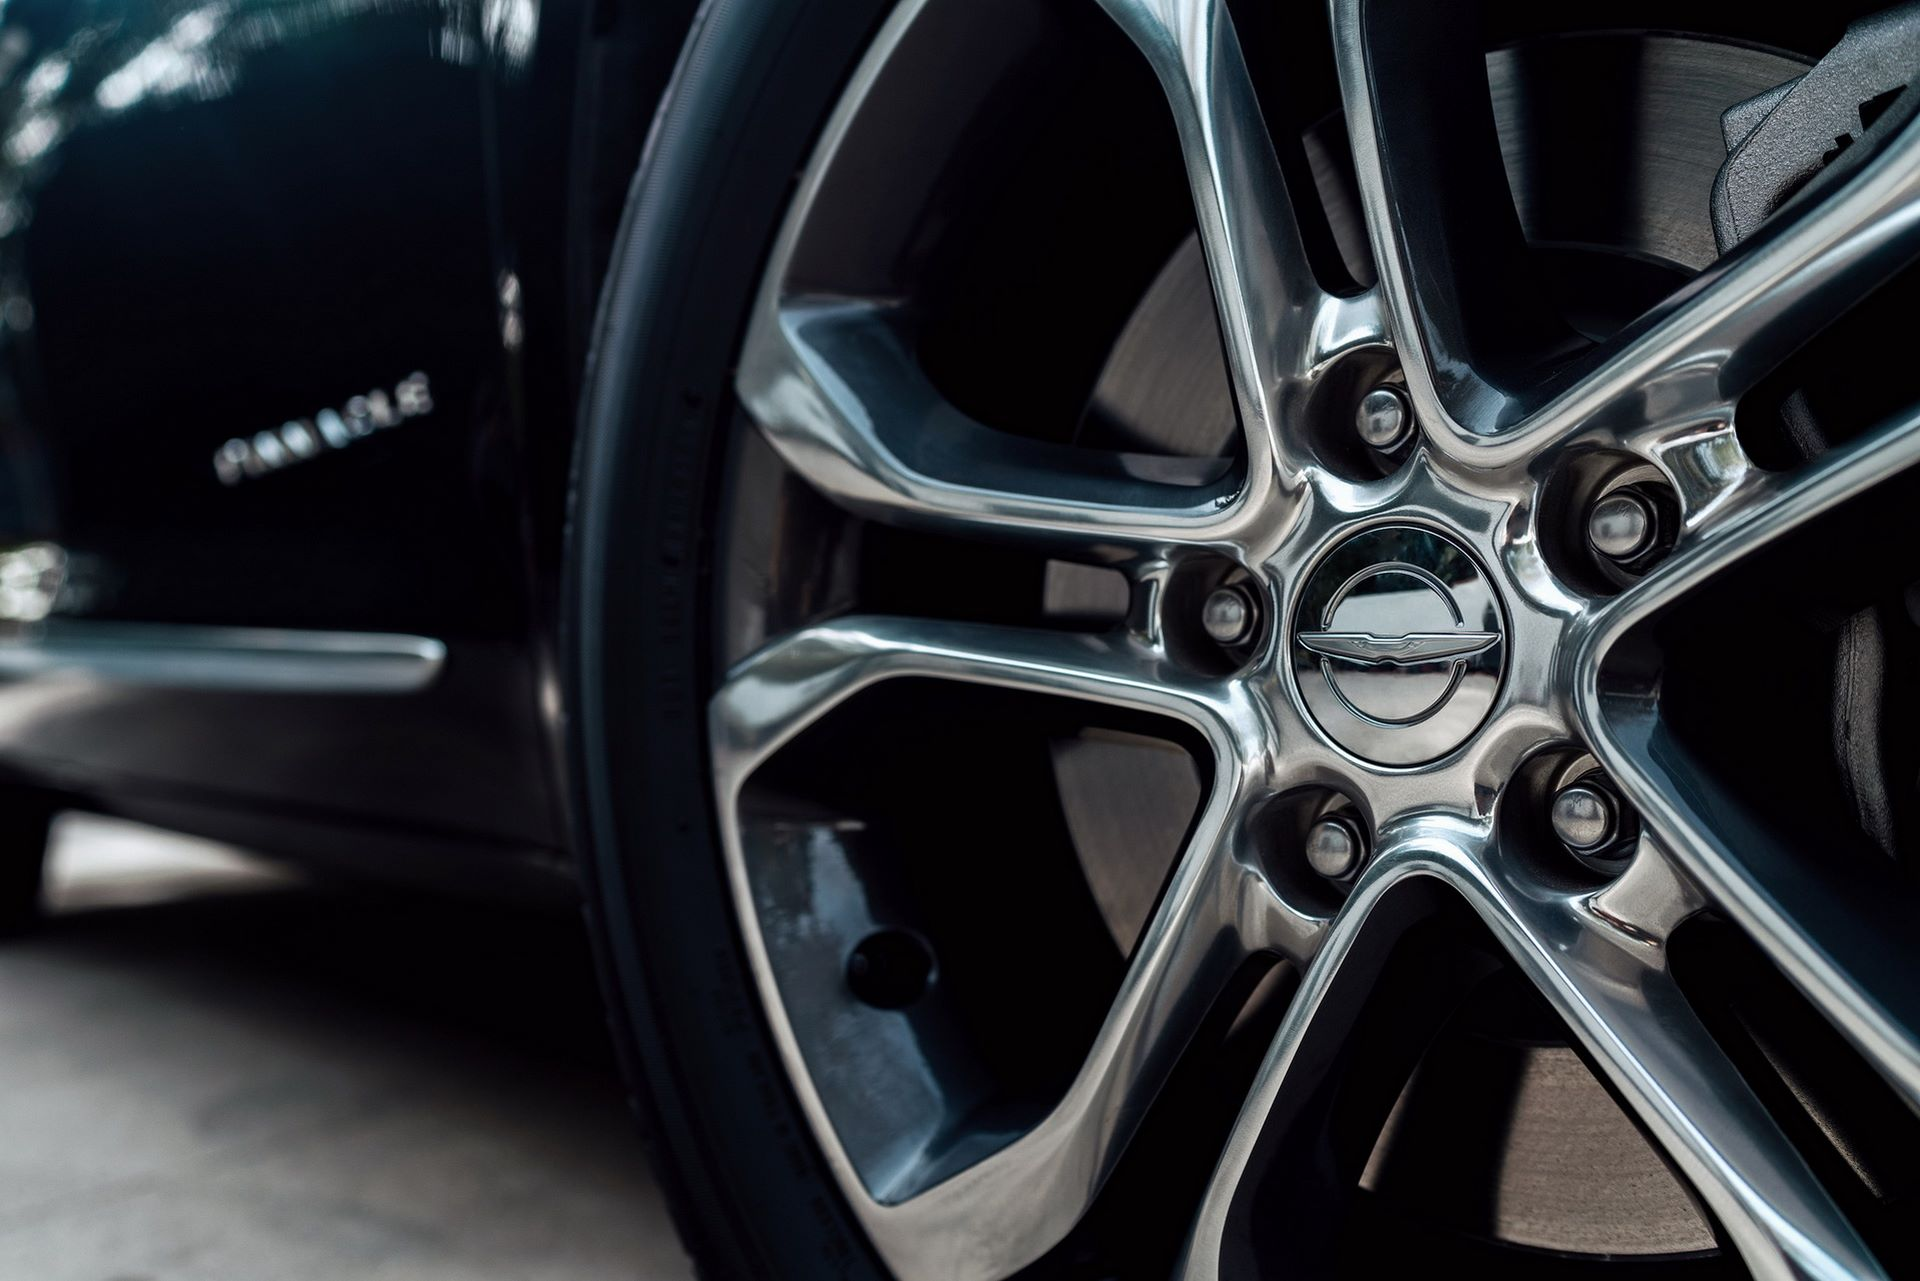 2021-Chrysler-Pacifica-32